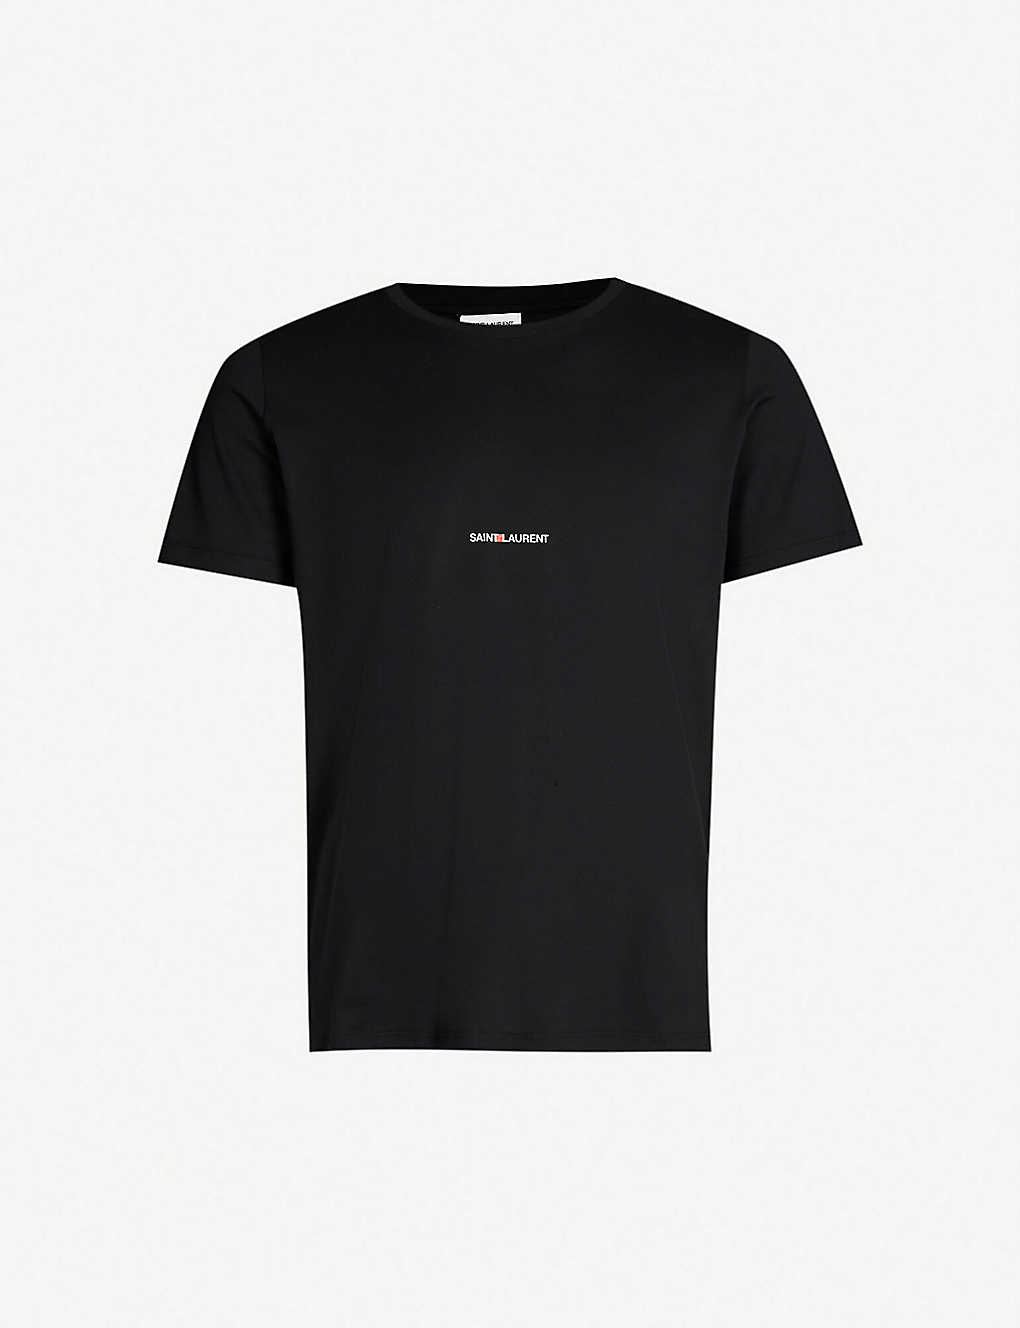 41e581d1b85 SAINT LAURENT - Logo-print cotton-jersey T-shirt | Selfridges.com